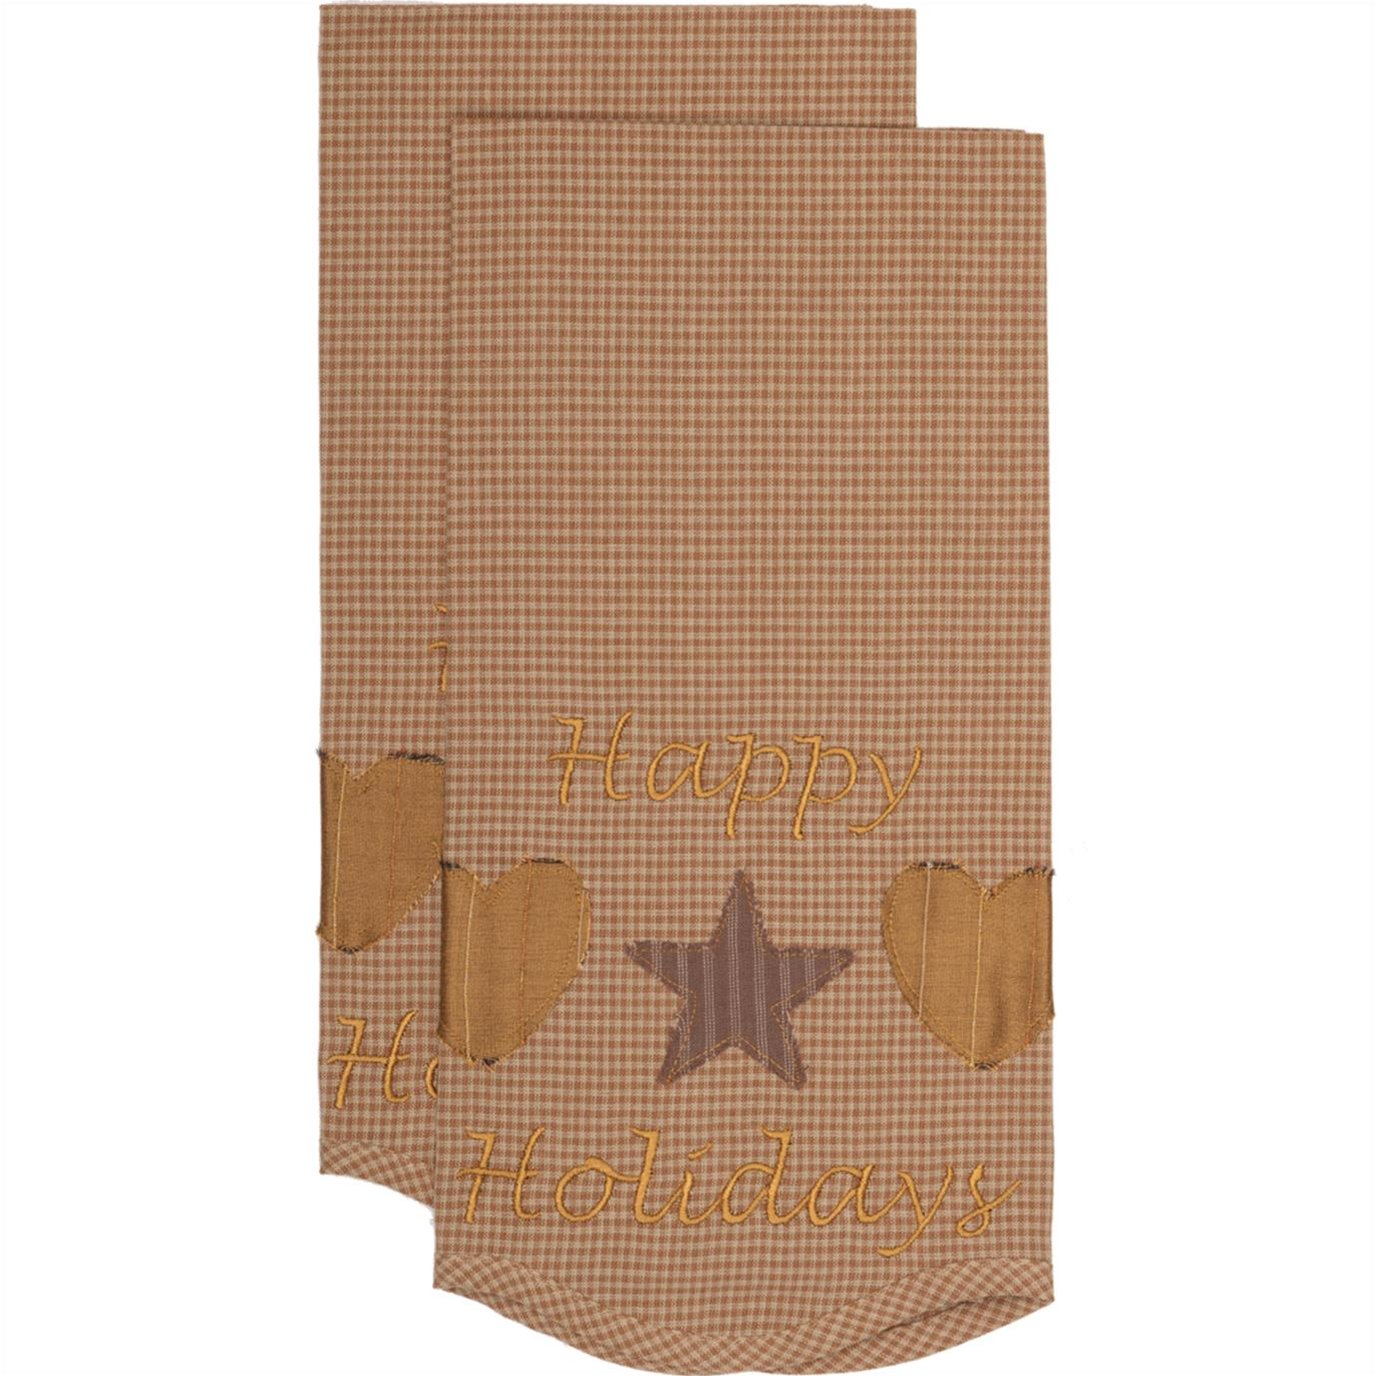 Hearts and Stars Tea Towel Set of 2 19x28